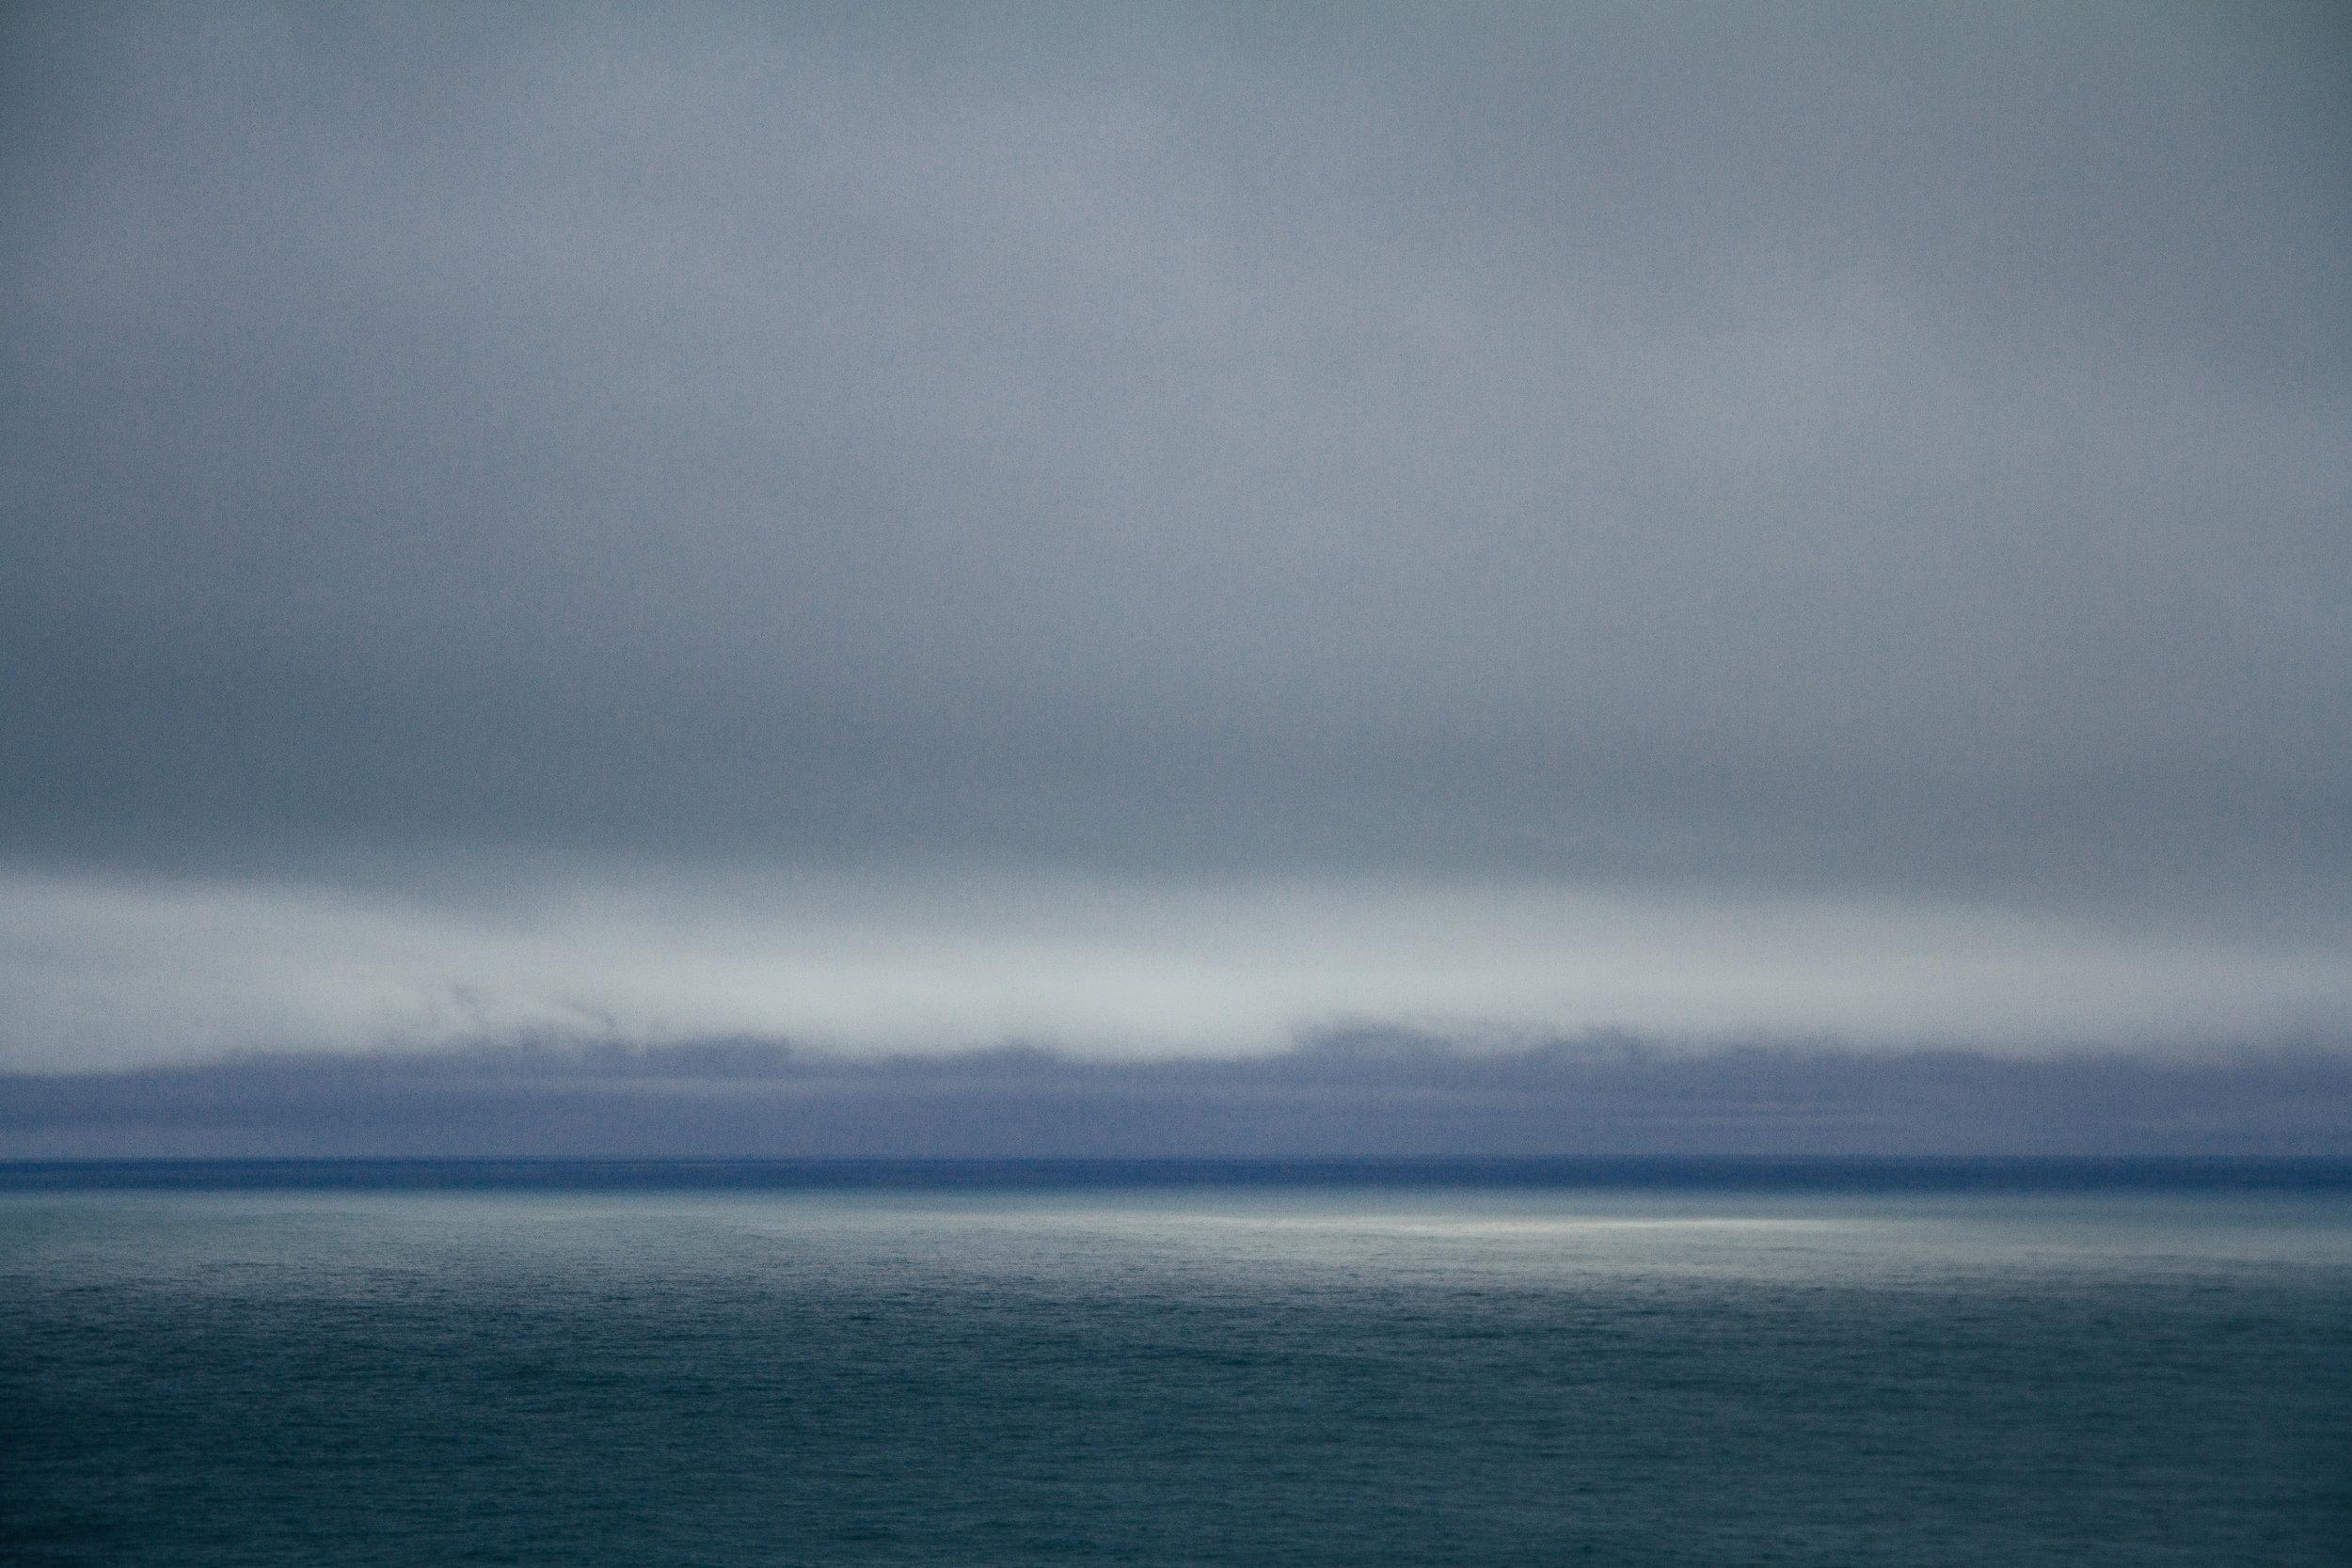 Point Reyes National Seashore, CA